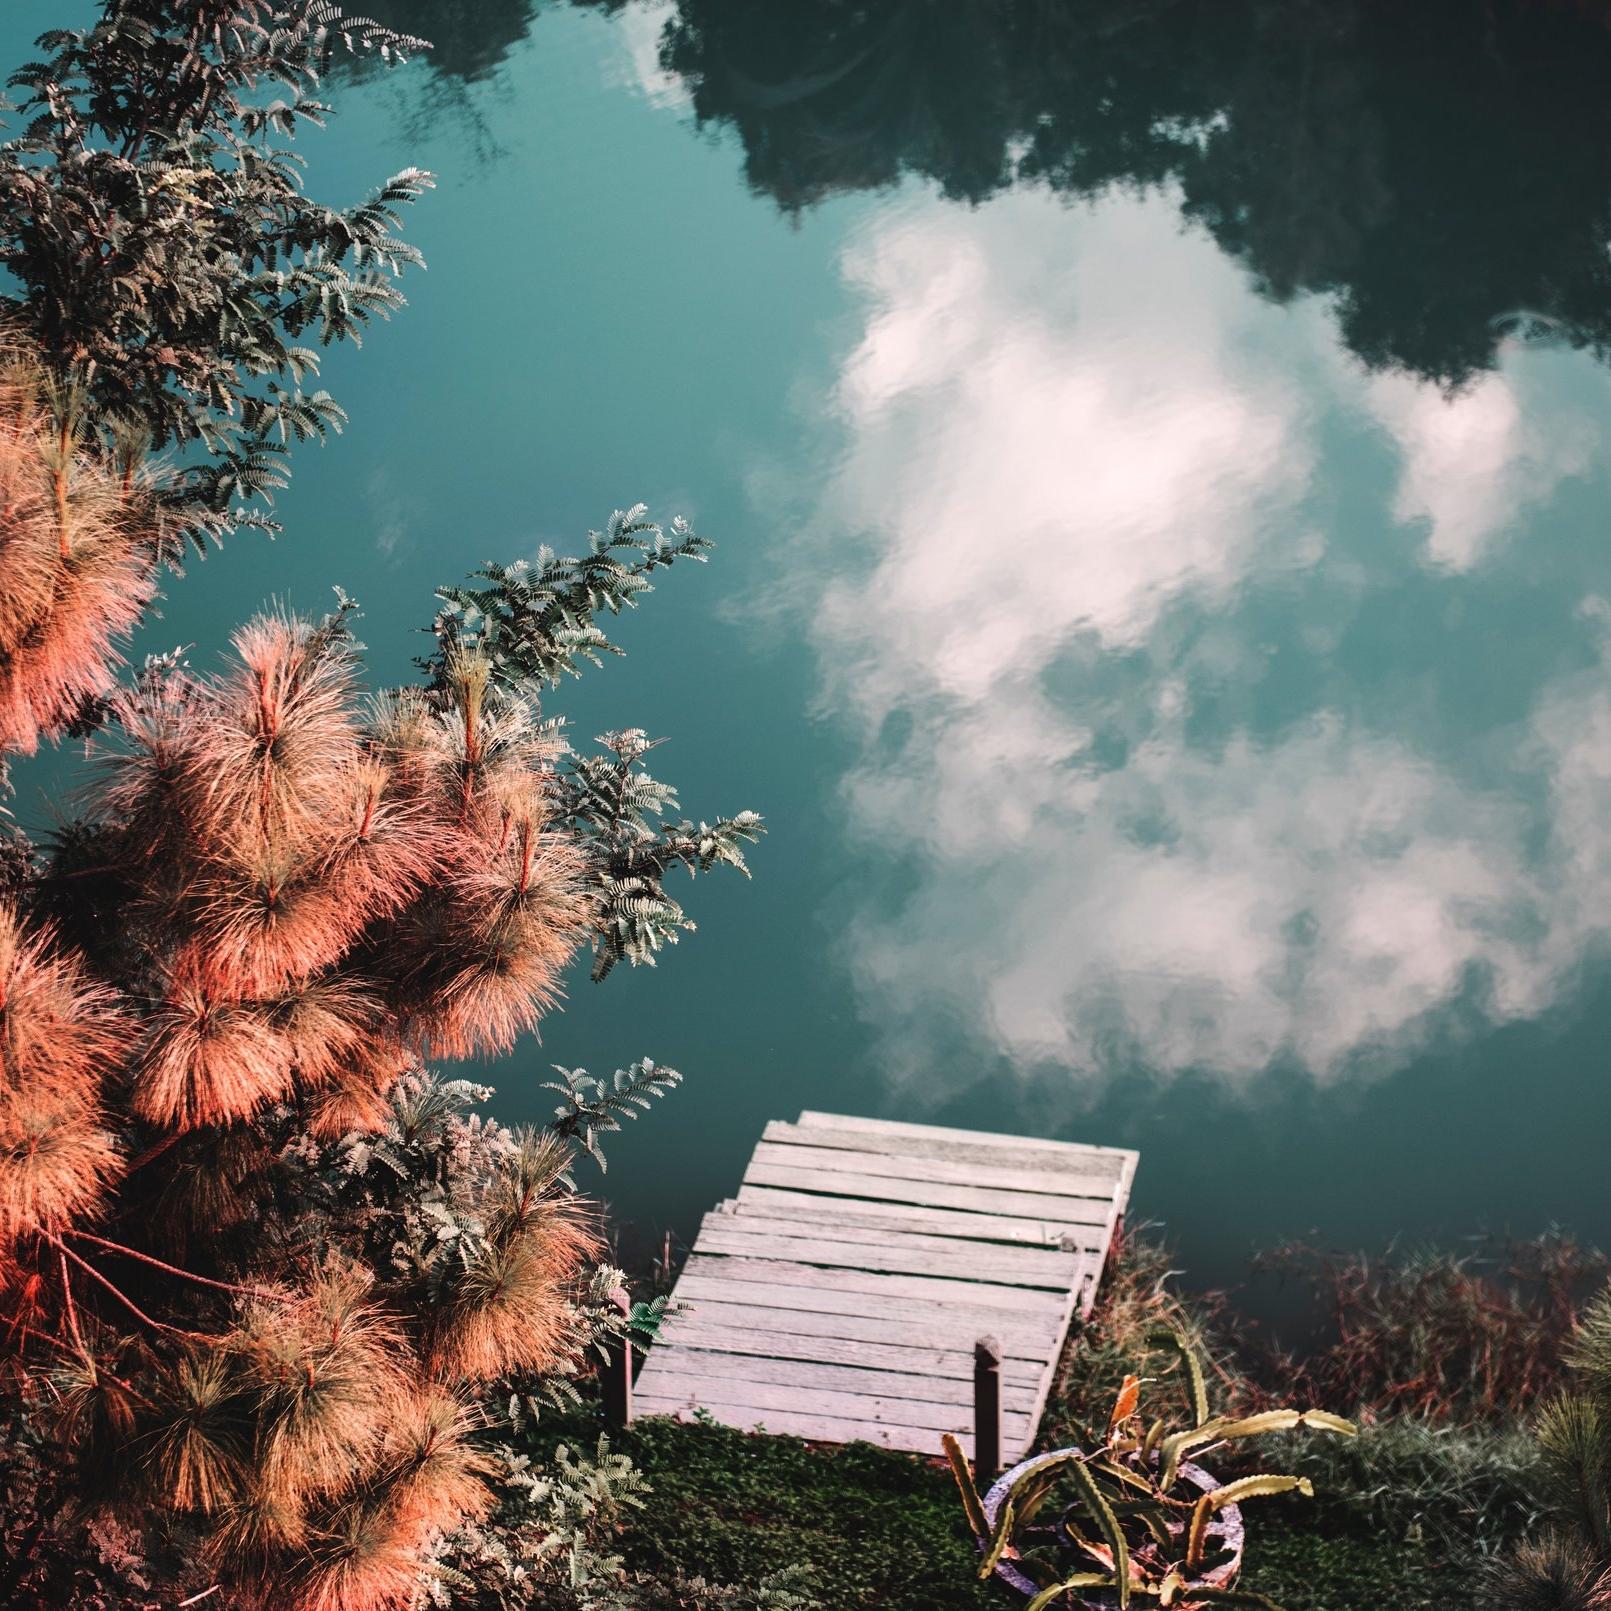 calm-clouds-daylight-326037.jpg